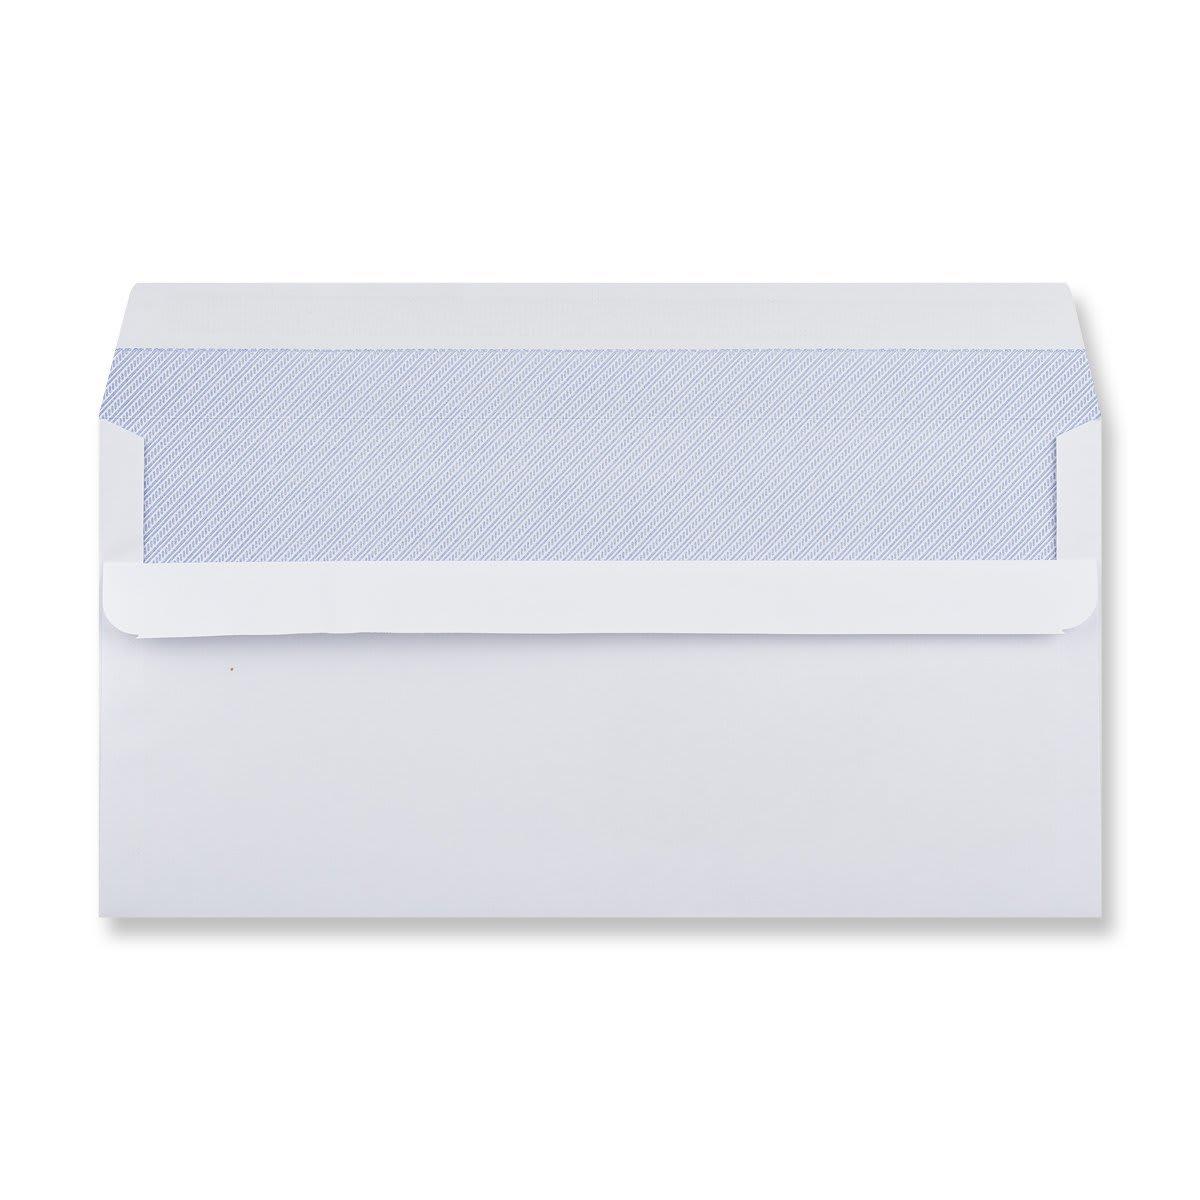 DL WHITE SELF SEAL WALLET WINDOW ENVELOPES 90GSM